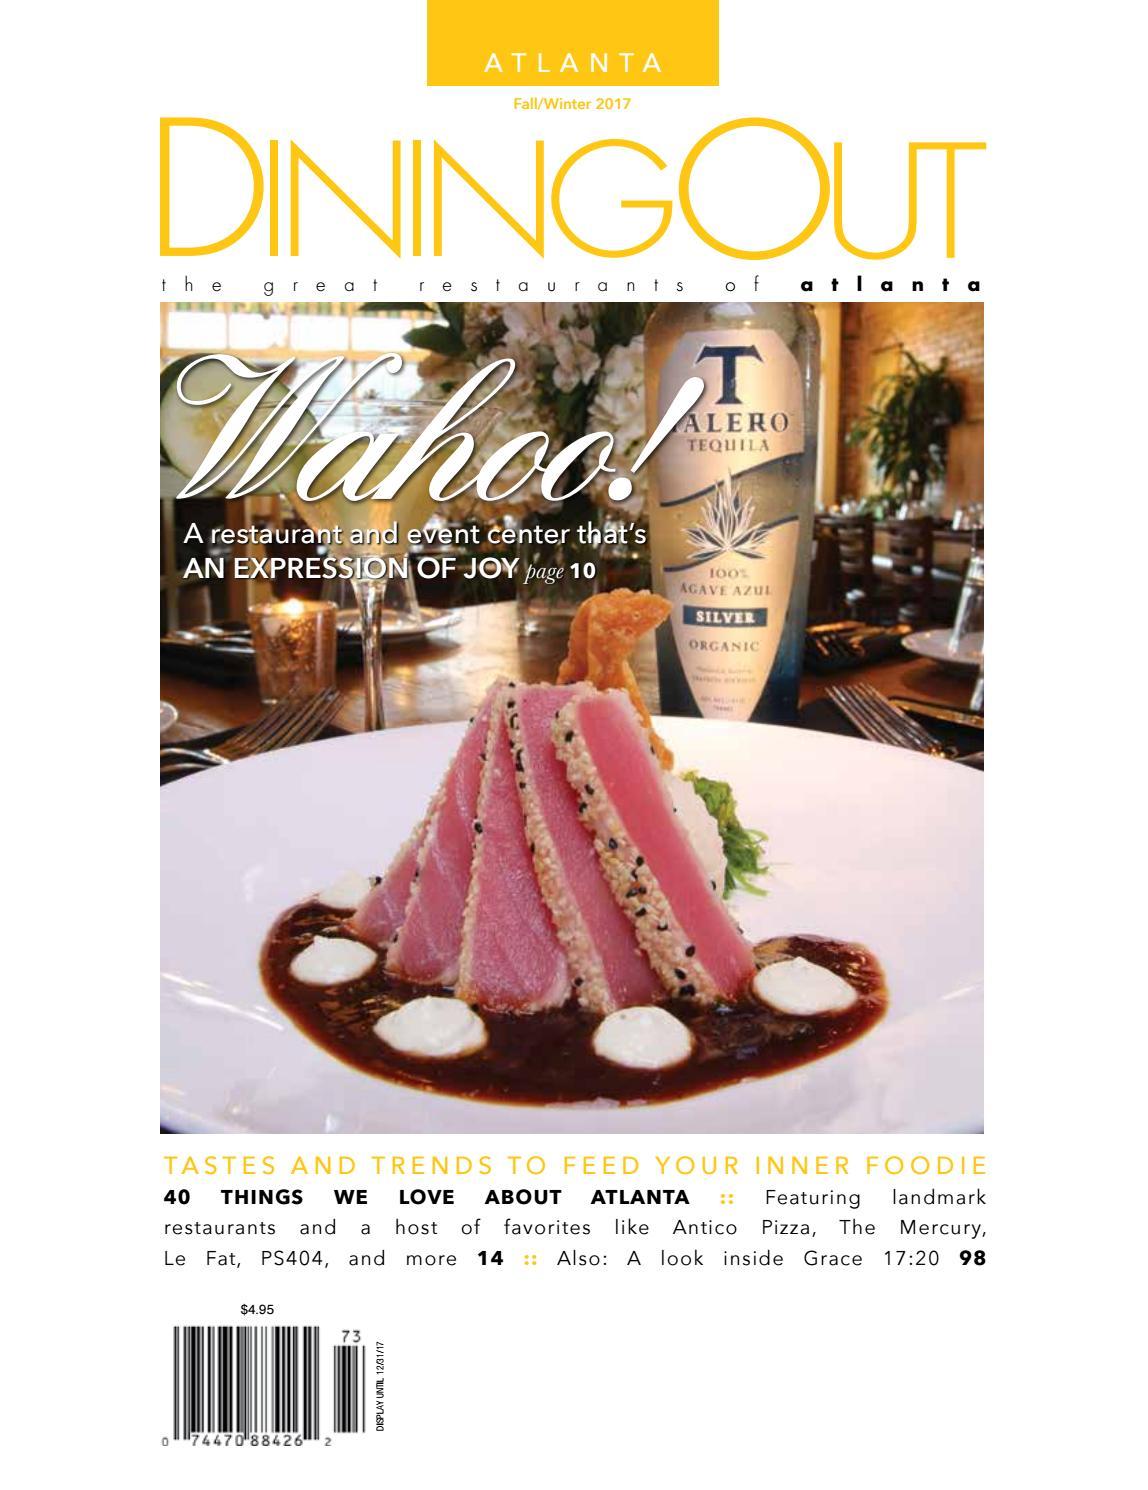 Diningout Atlanta Fall Winter 2017 By Diningoutatl Issuu Curcuma Rmulsion Blackcurrant Flavour